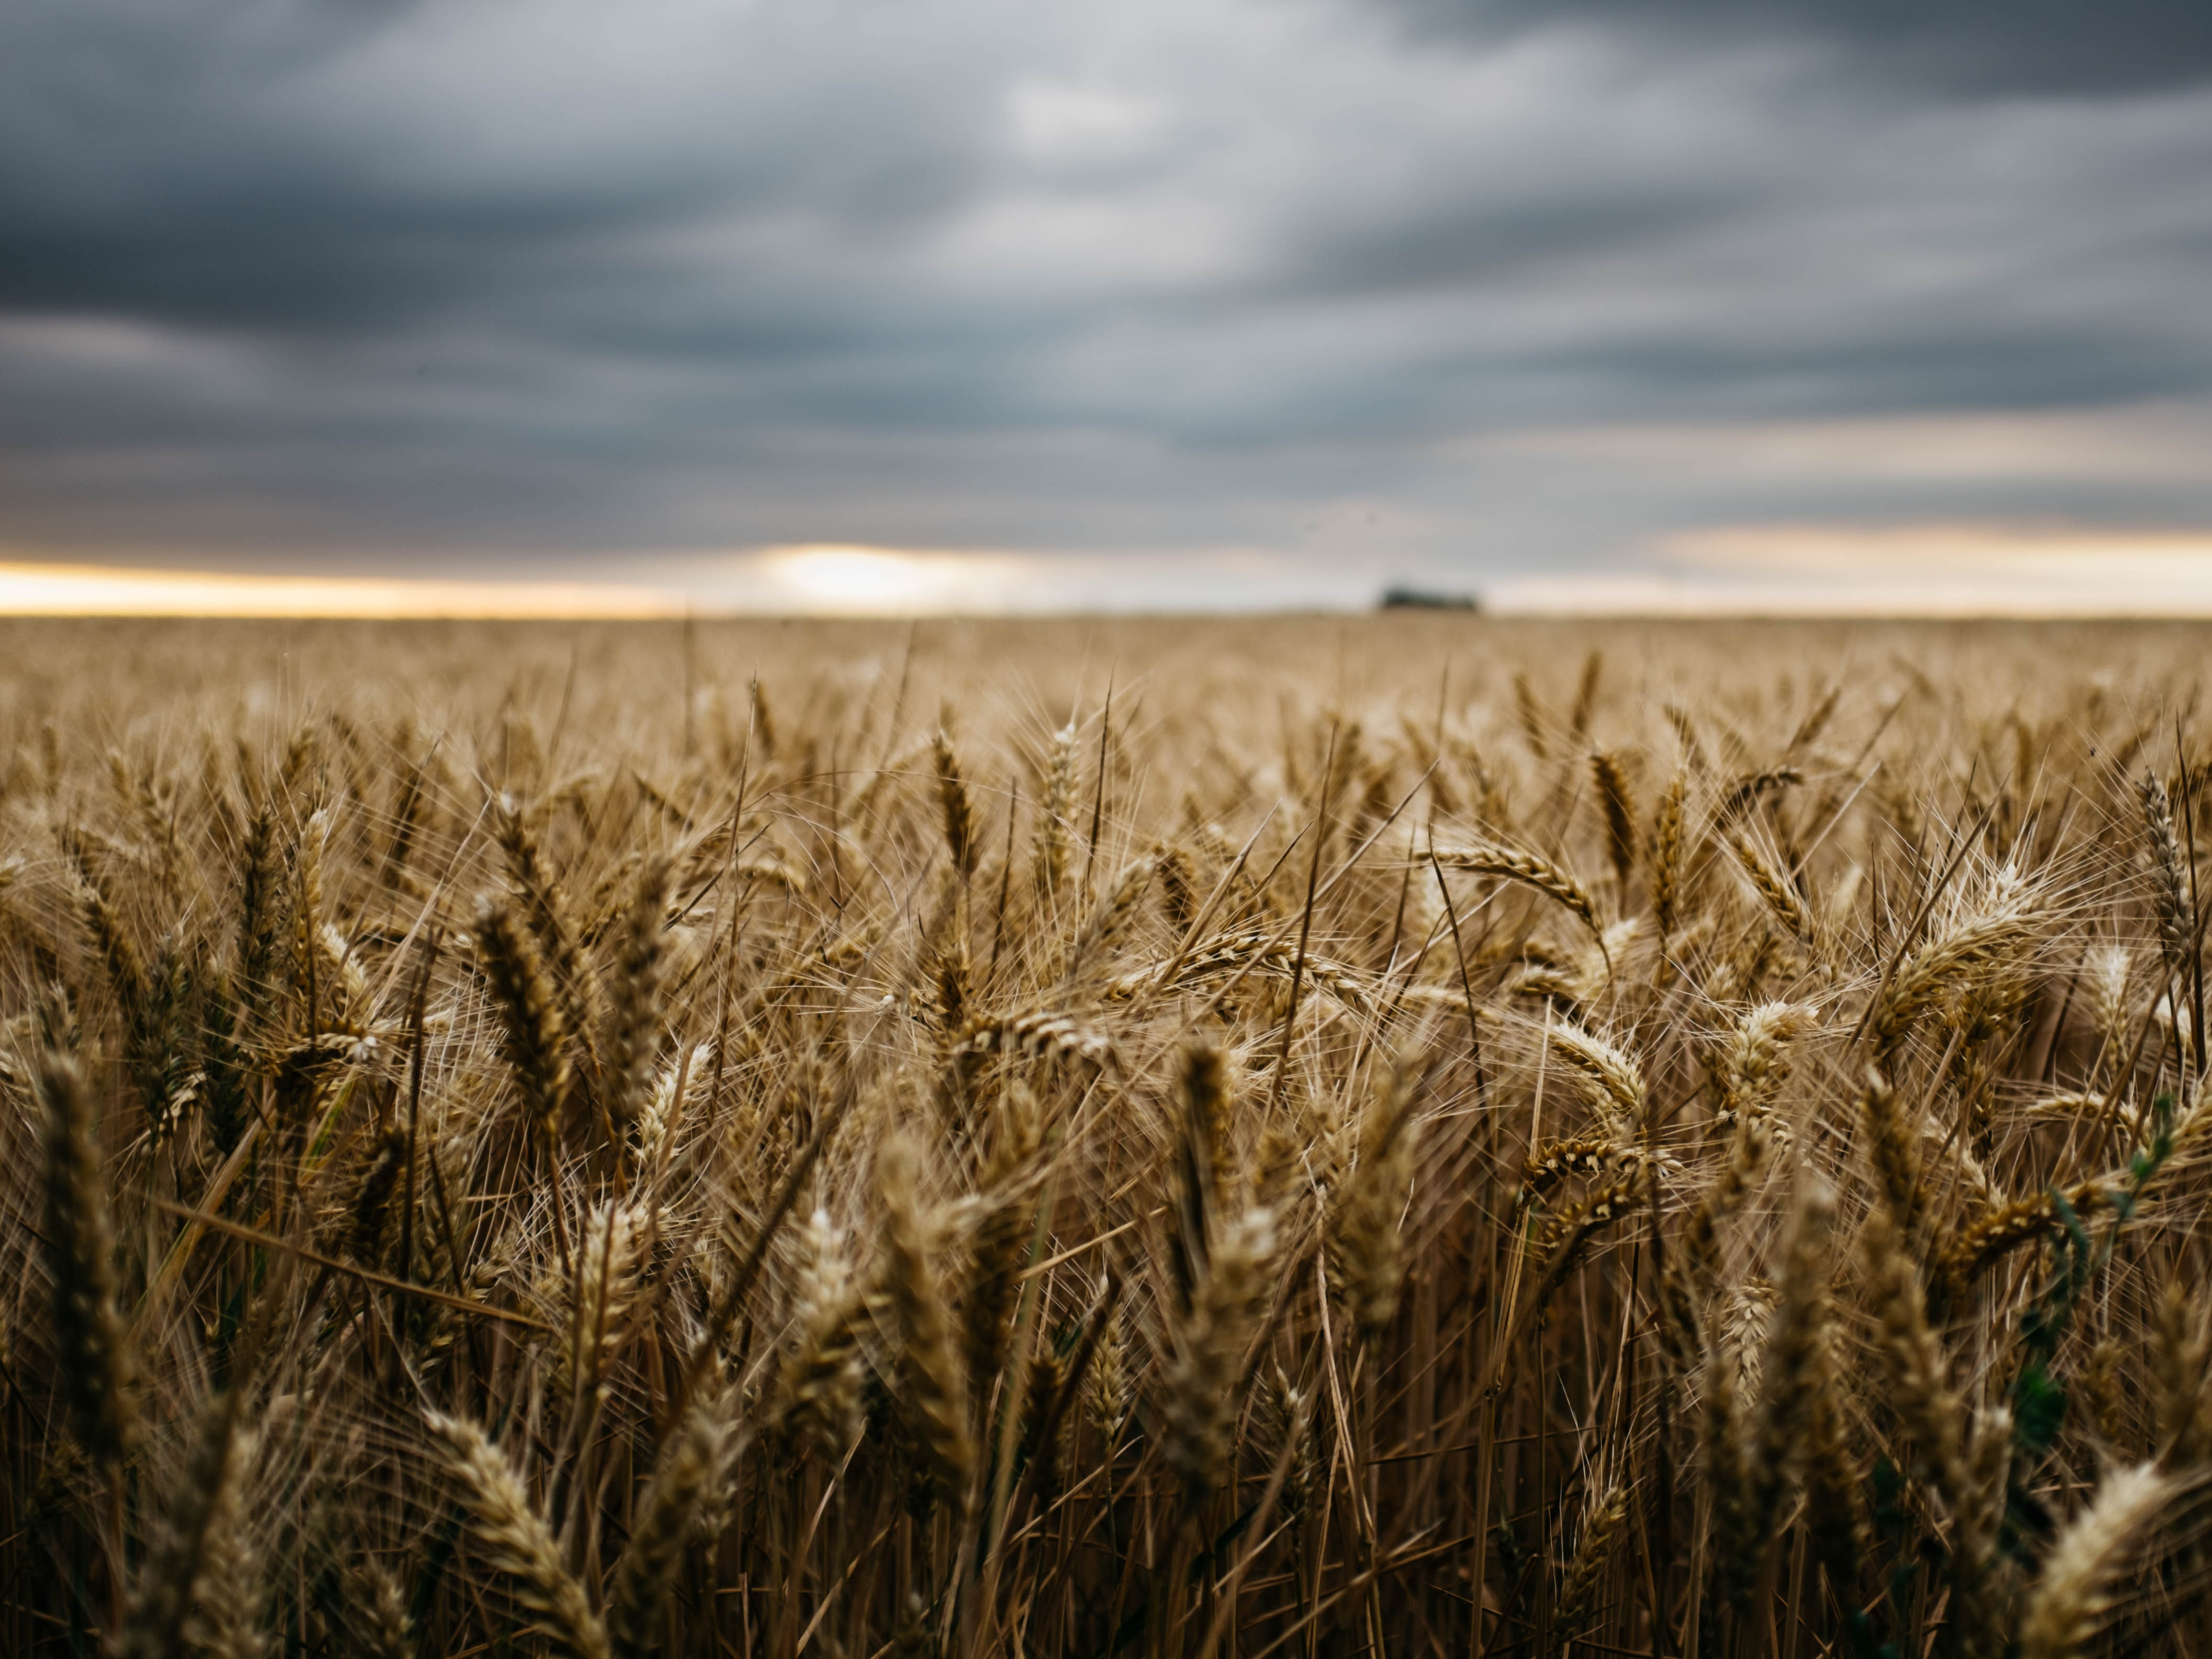 bokeh photography of a wheat field